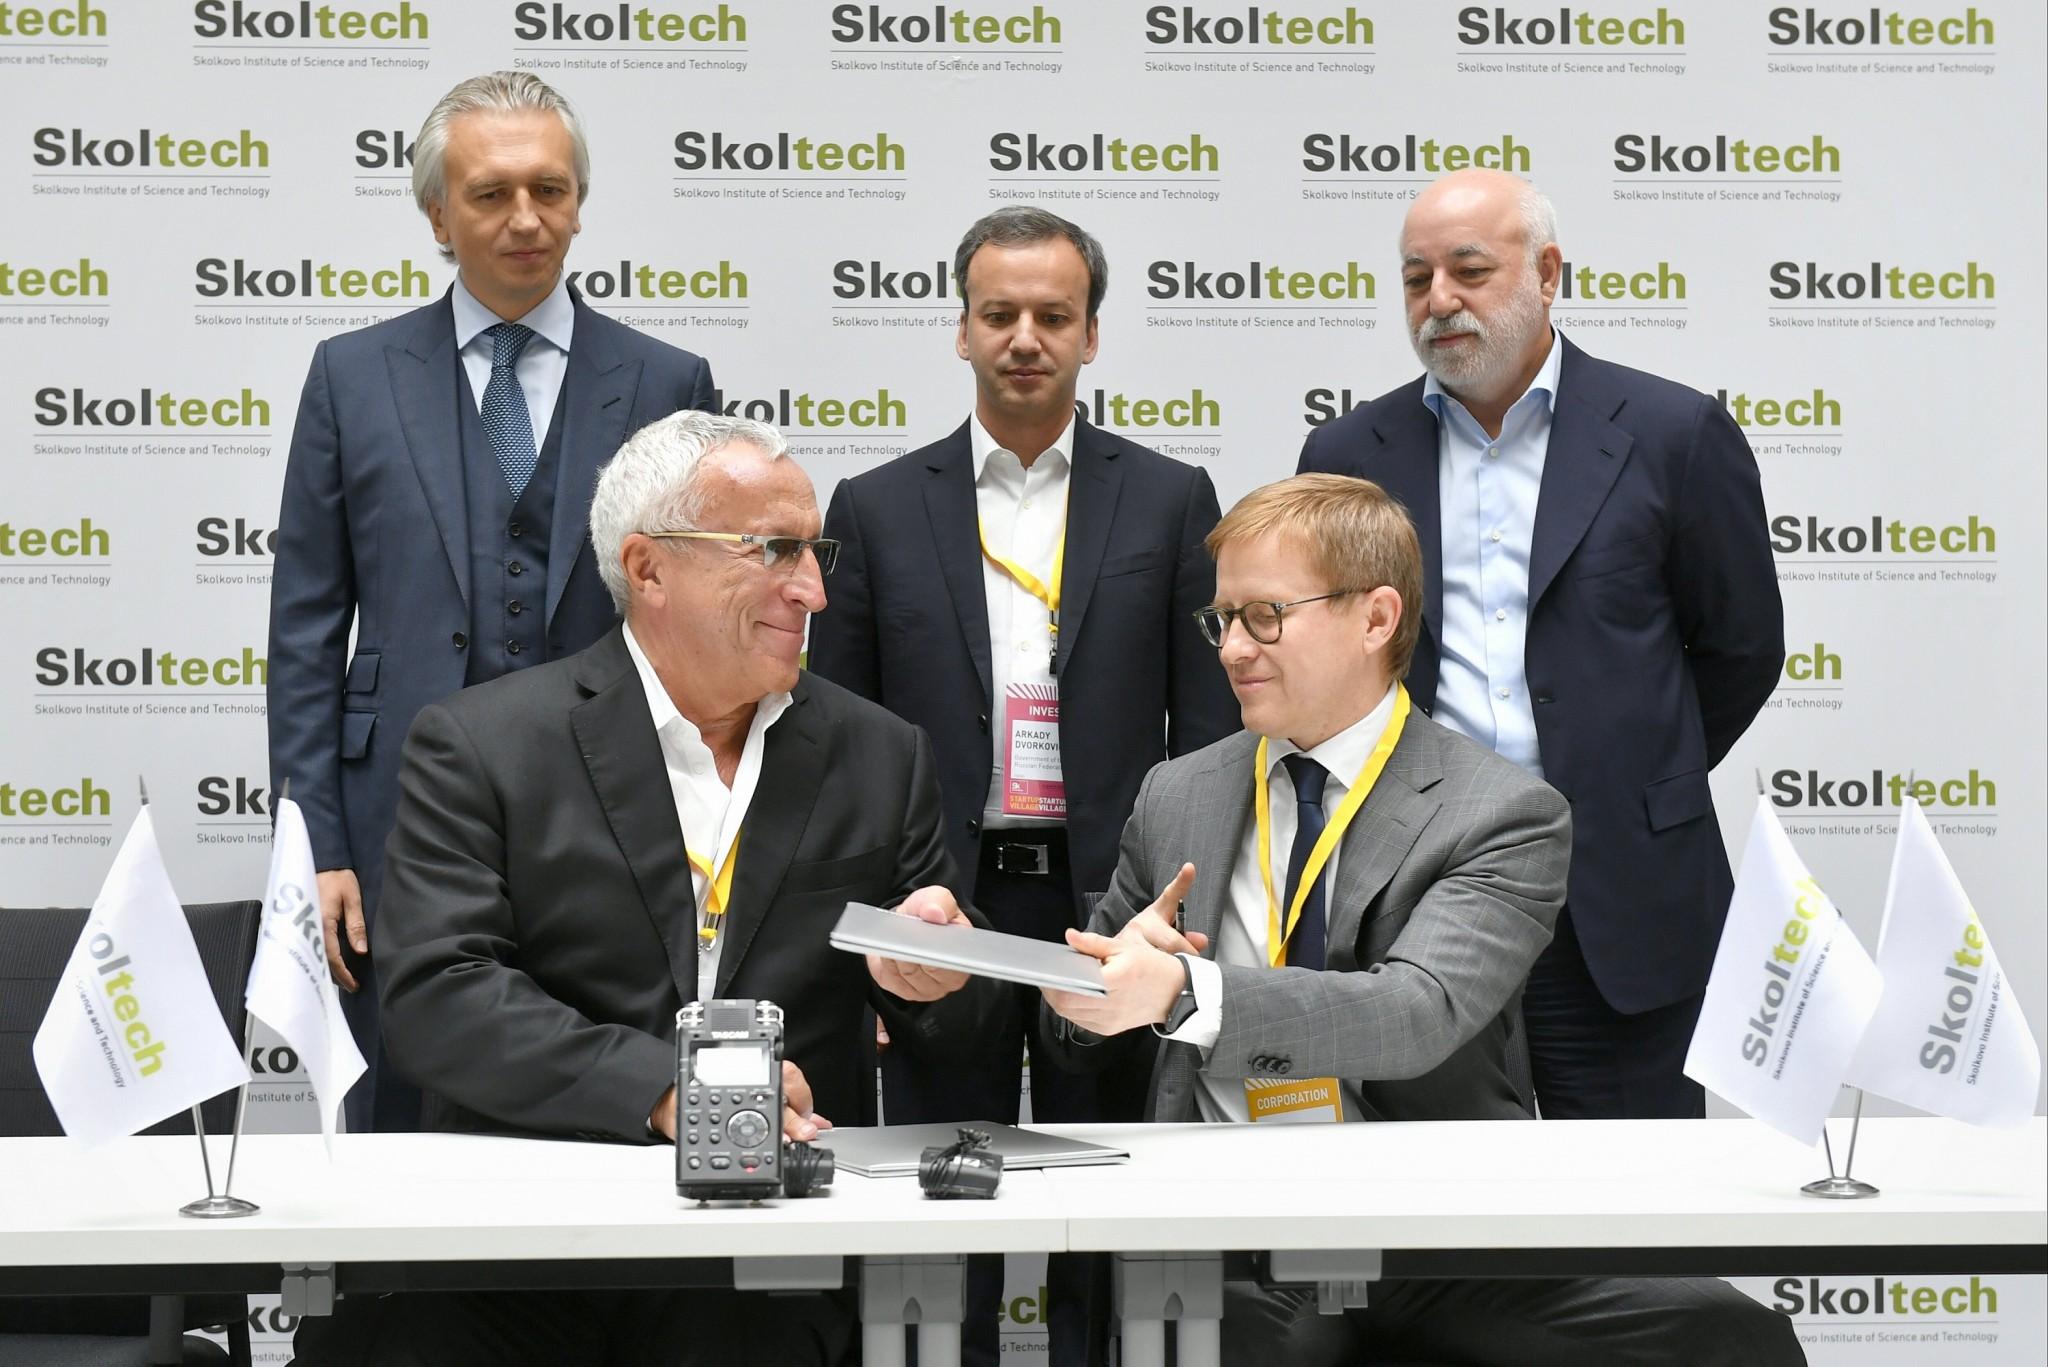 Skoltech President Alexander Kuleshov (bottom left) and Gazprom Neft First Deputy CEO Vadim Yakovlev (bottom right) sign a cooperation agreement as Gazprom Neft CEO Alexander Dyukov, Russian Deputy Prime Minister Arkady Dvorkovich and Skolkovo Foundation President Victor Vekselberg (top left to right) look on.